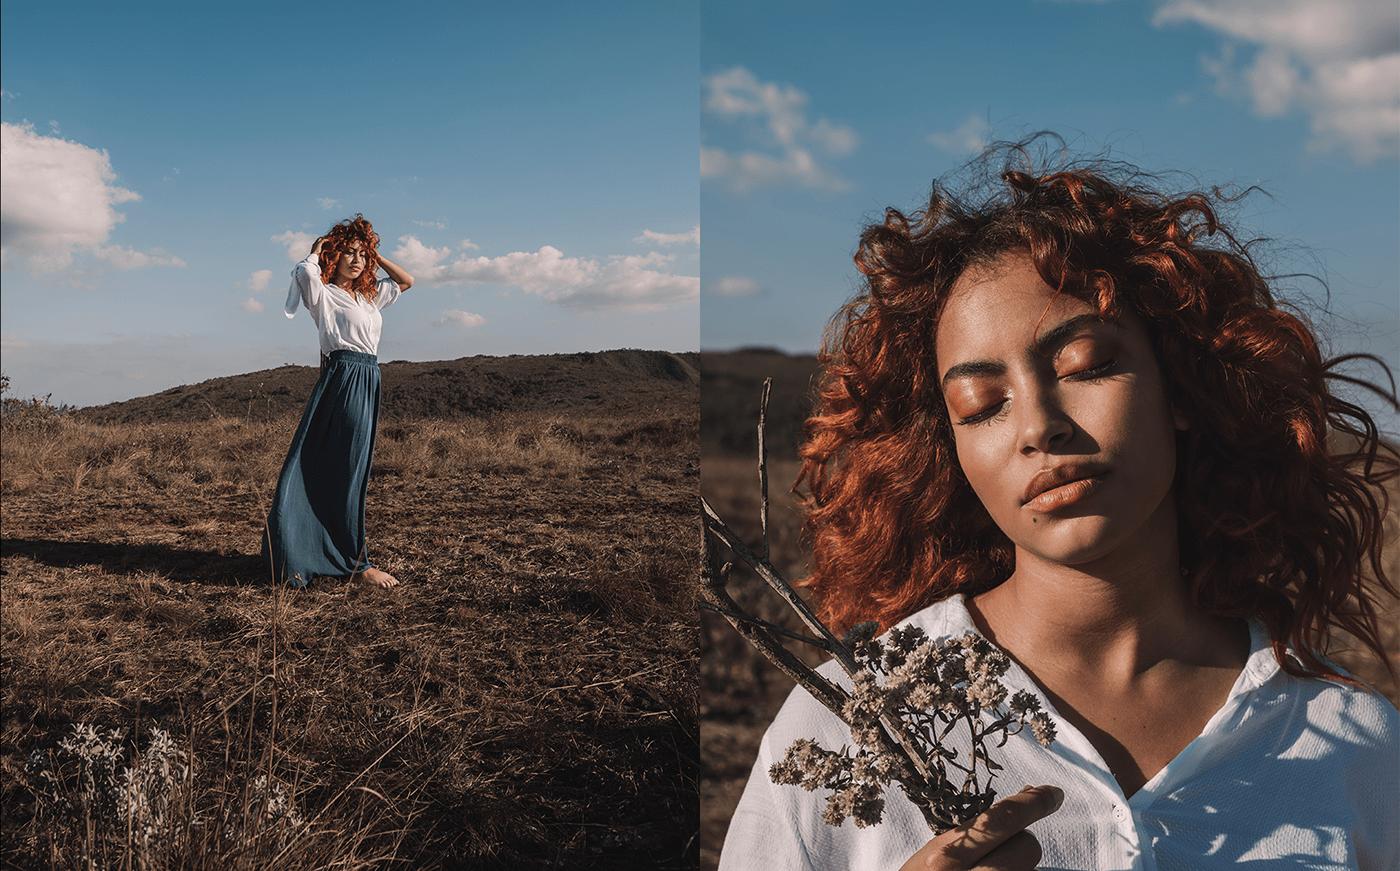 Fashion ,identity,blue,gold,beauty,portrait,moda,mountain,concept,experiment